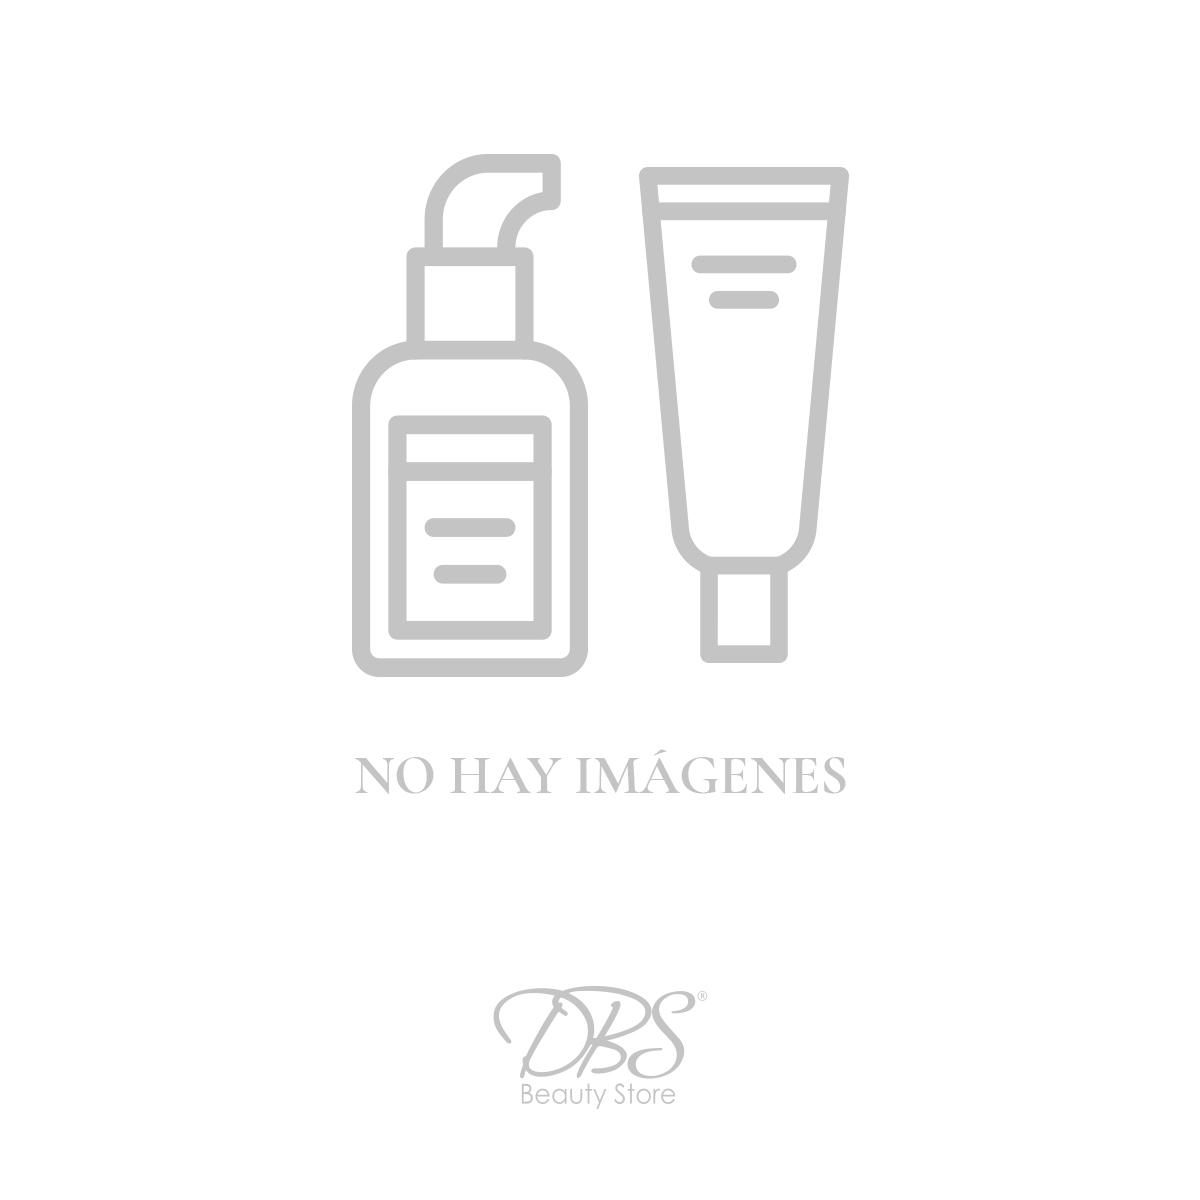 body-luxuries-BL-BN08591.jpg